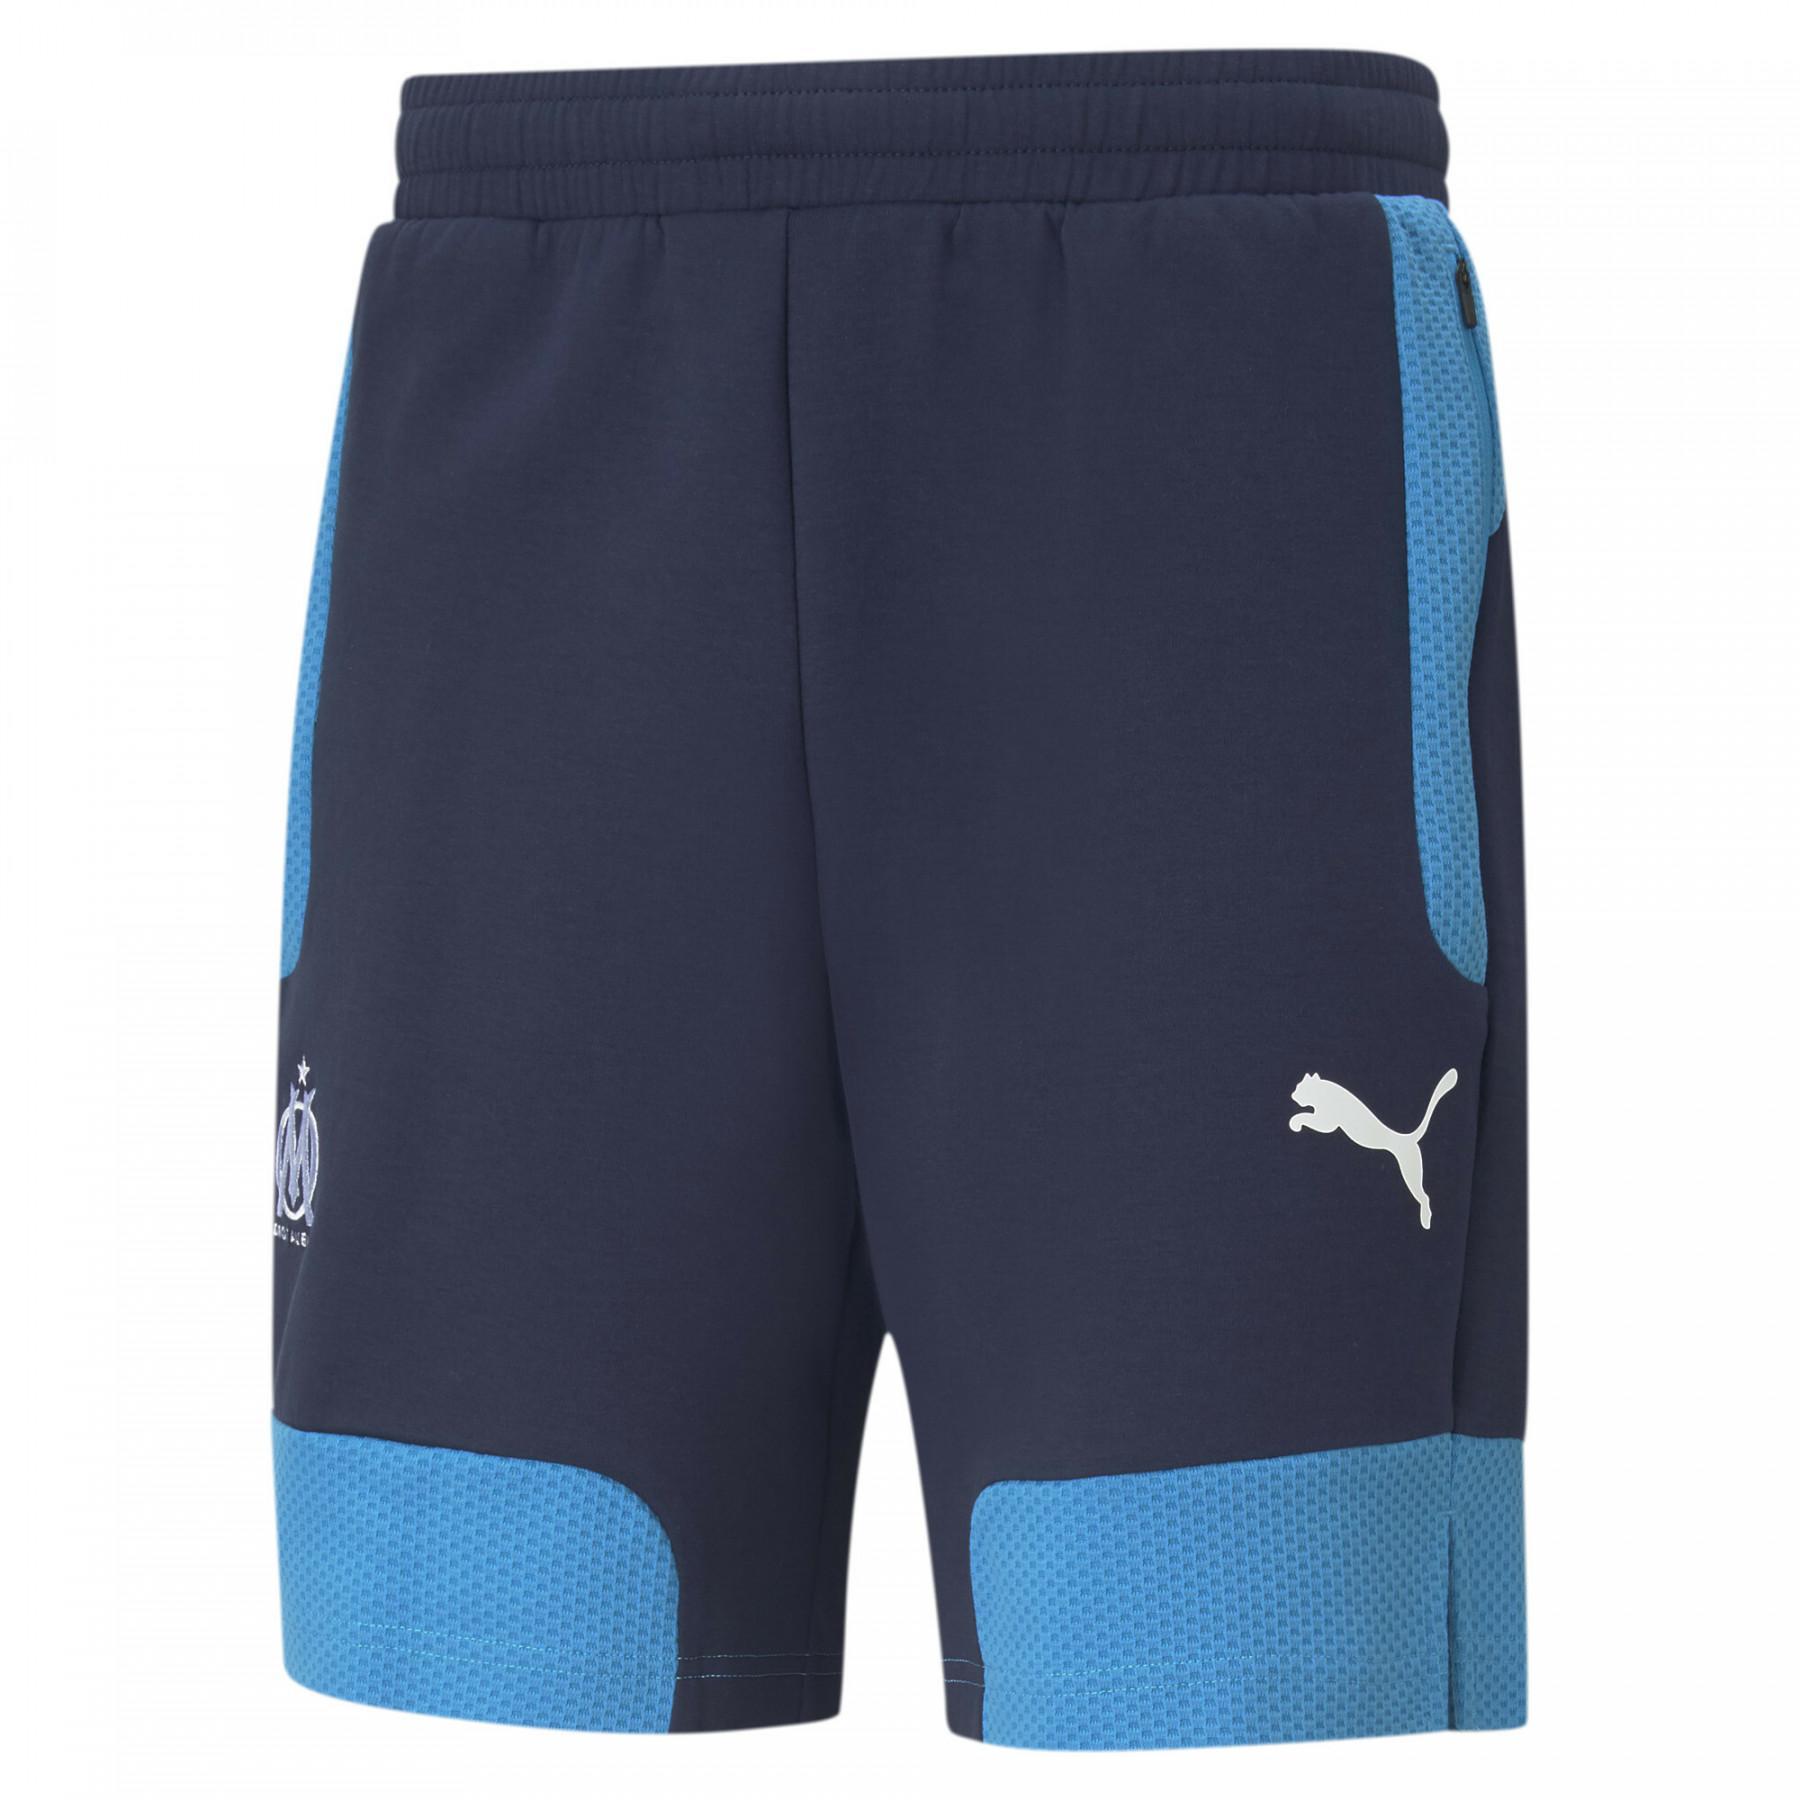 Evostripe Marseille Olympic Puma Shorts